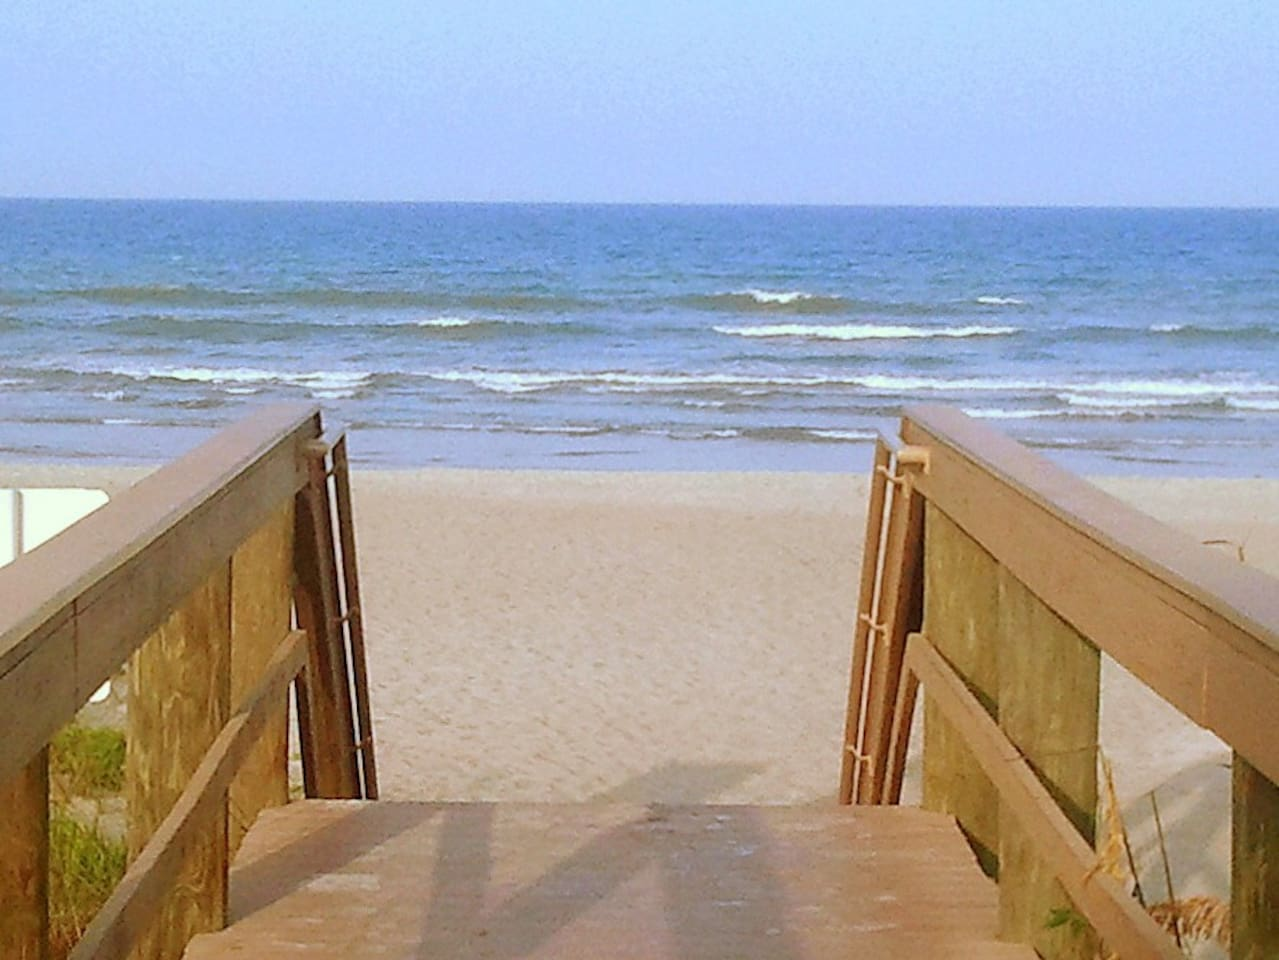 Beach access from complex